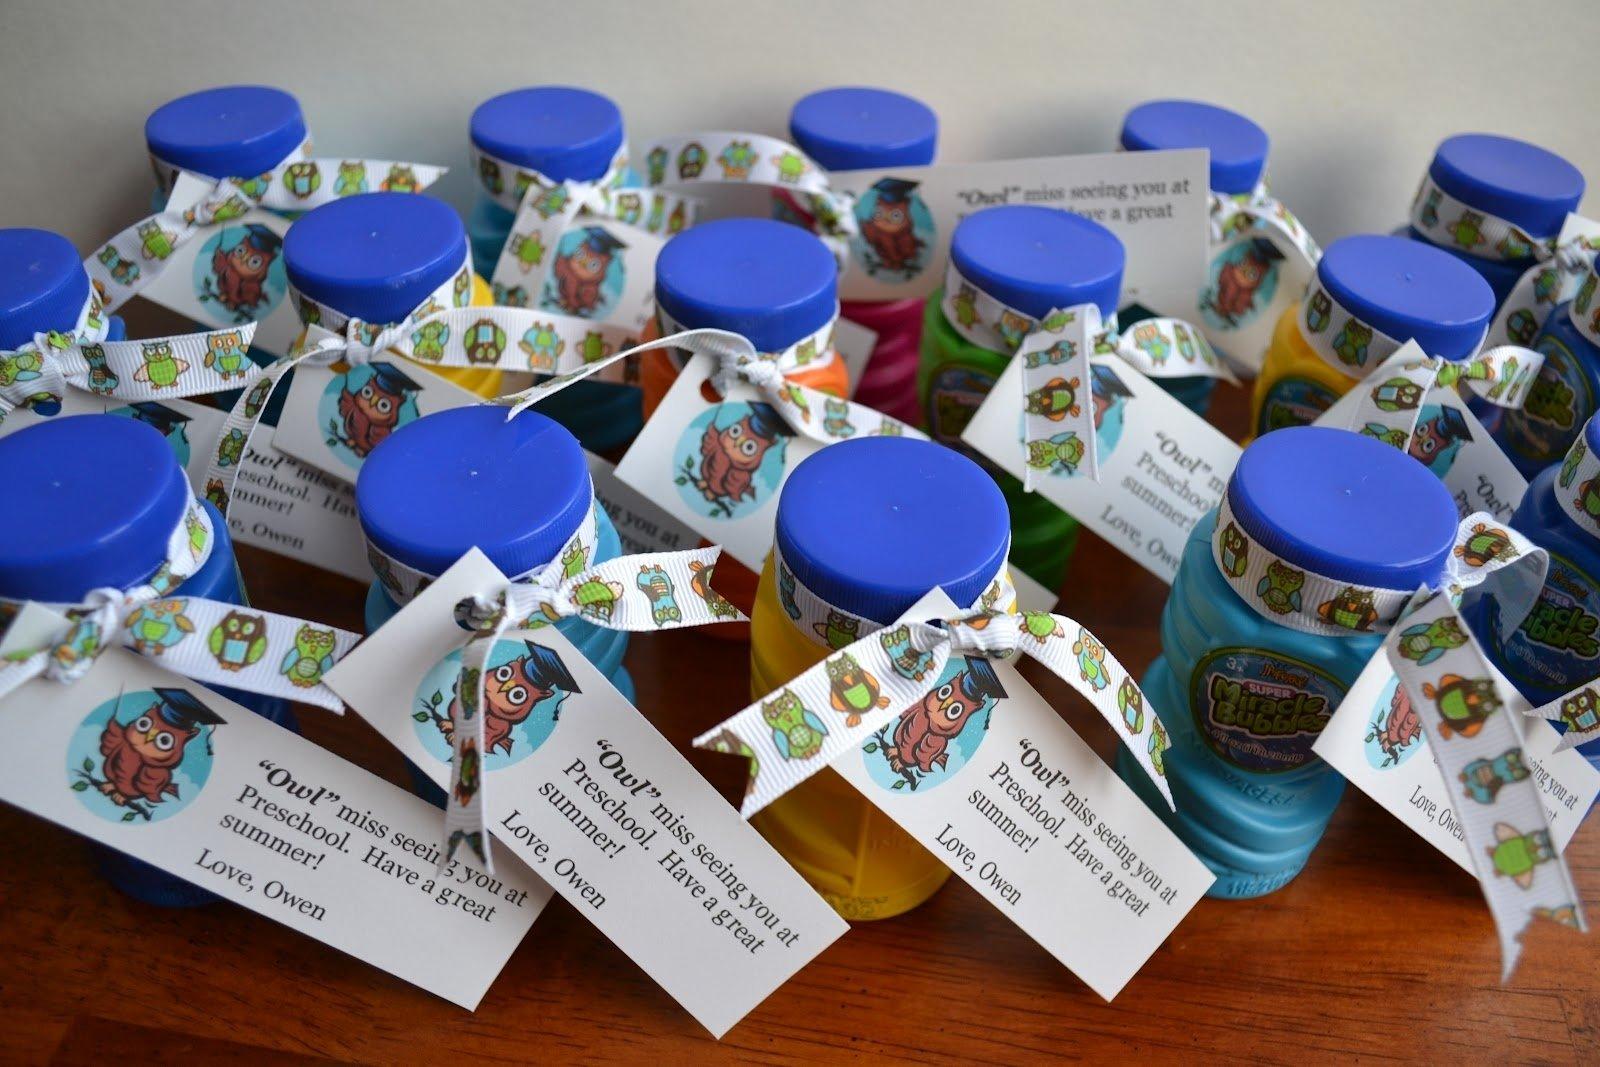 10 Great Gift Ideas For Kindergarten Graduation dsc 0113 1600x1067 pixels daycare pinterest